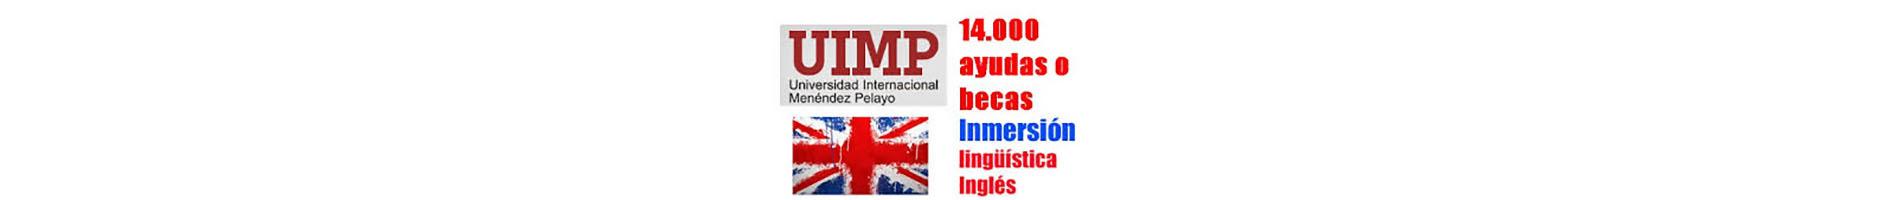 Universidad Menendez Pelayo